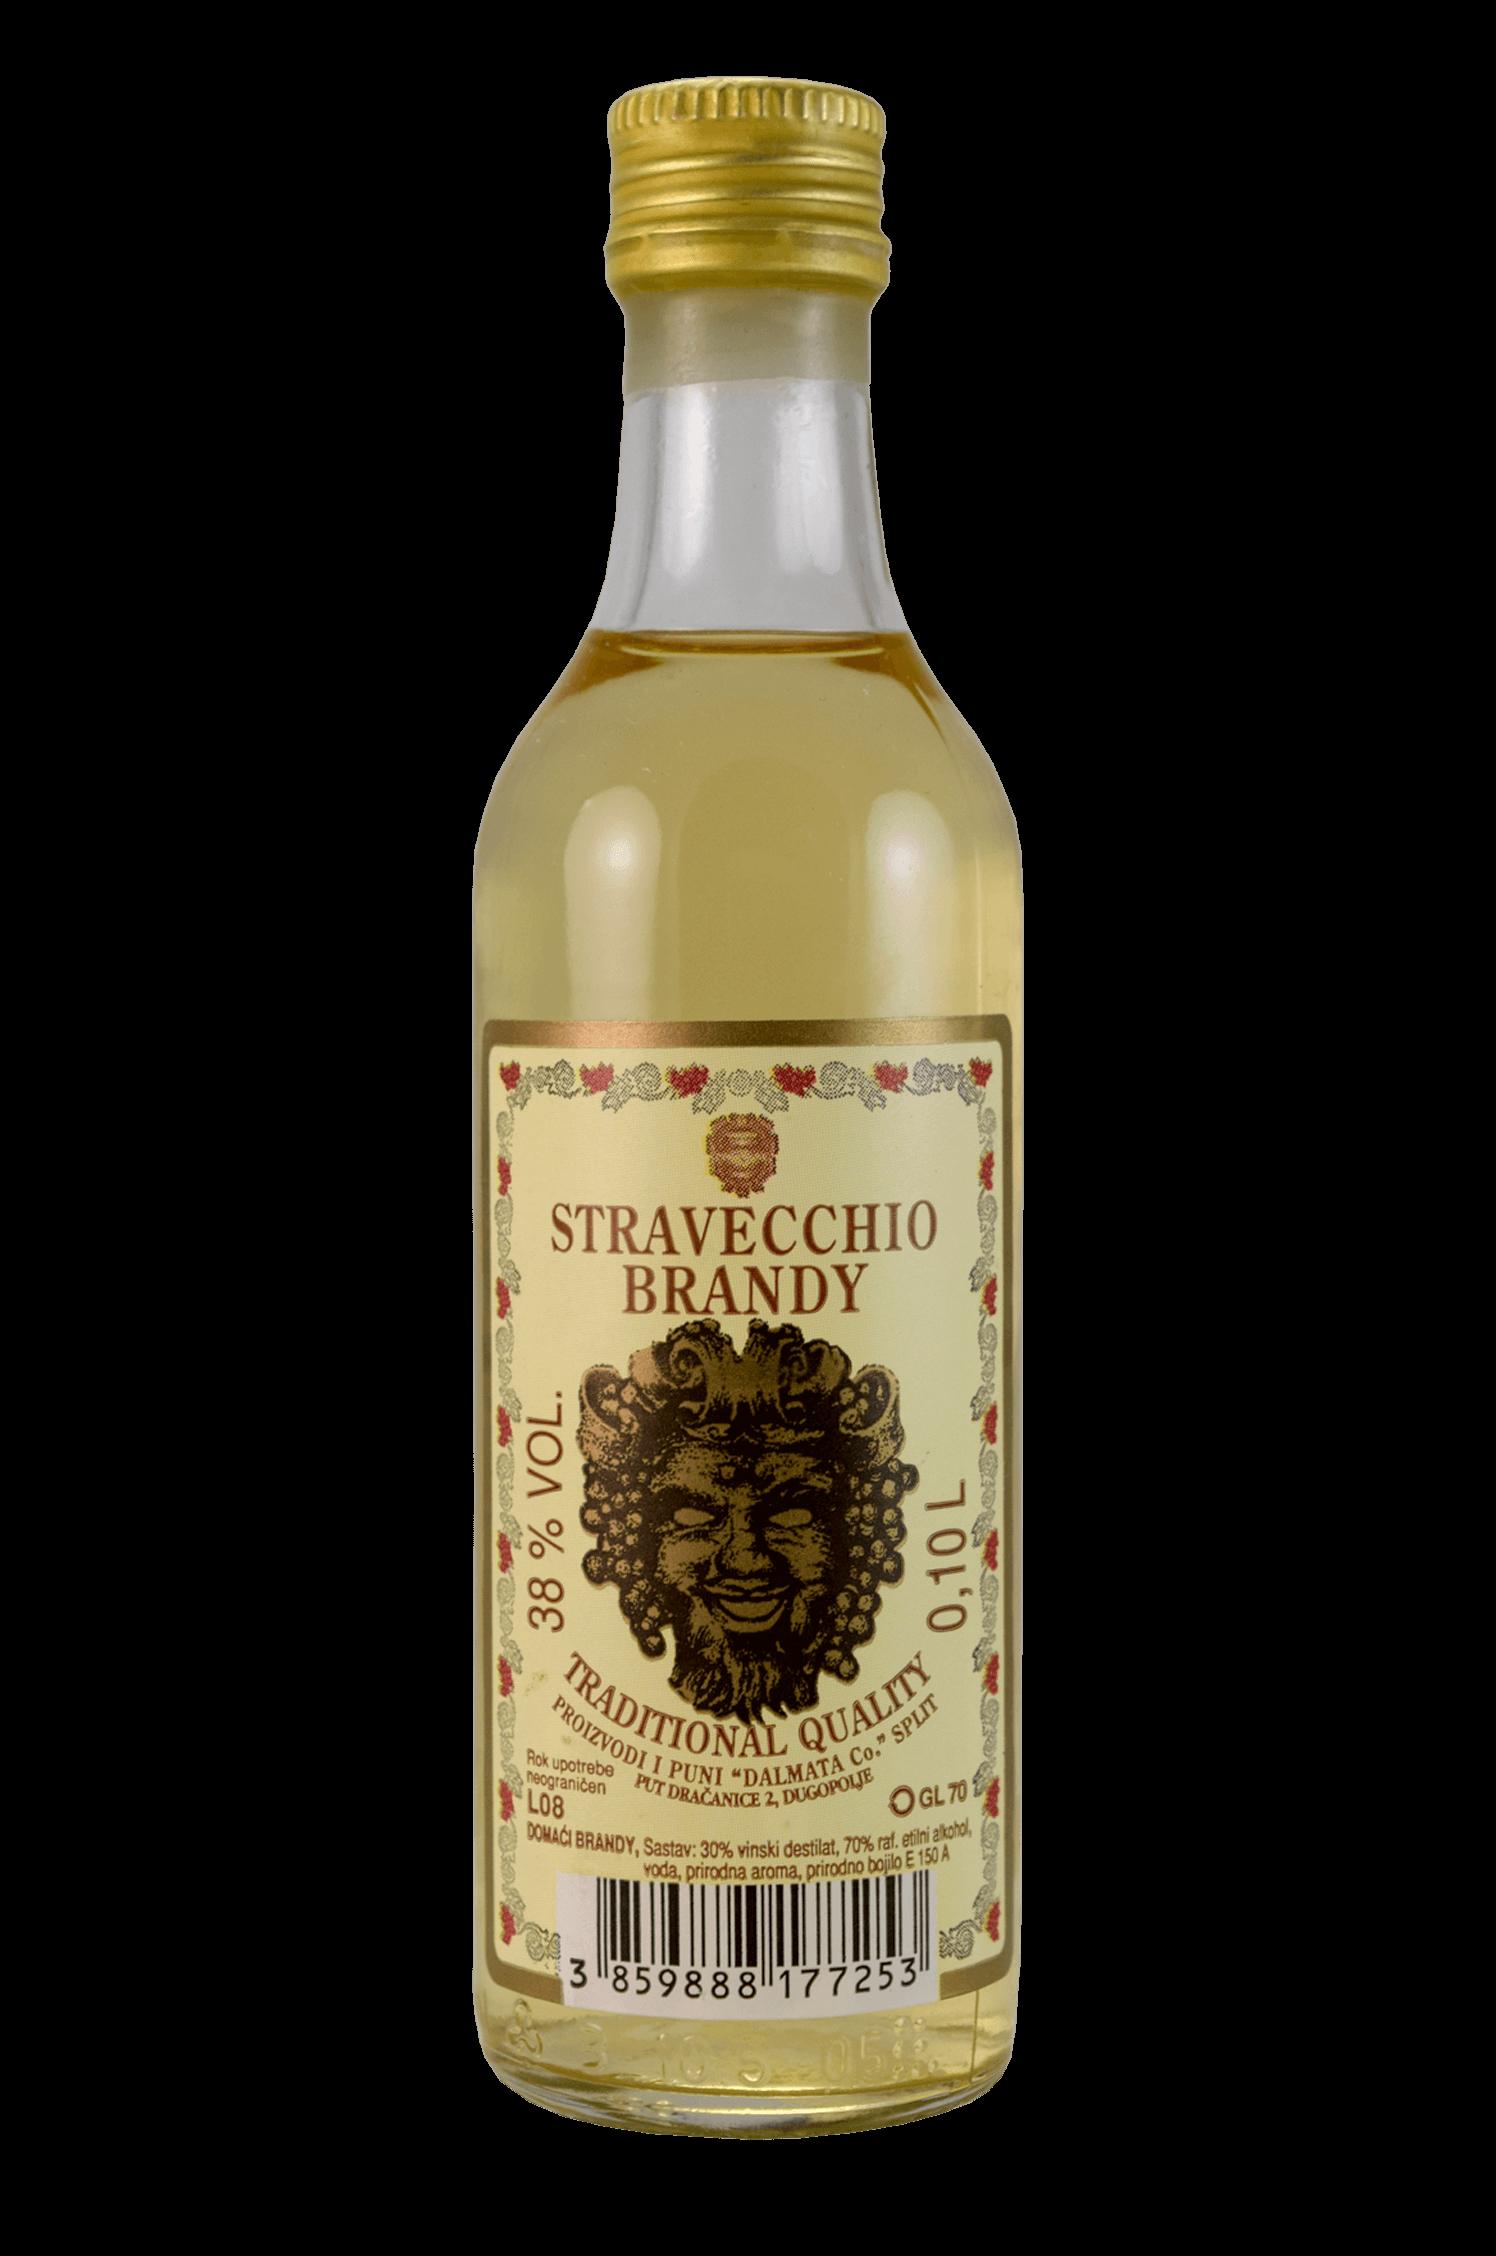 Stravecchio Brandy